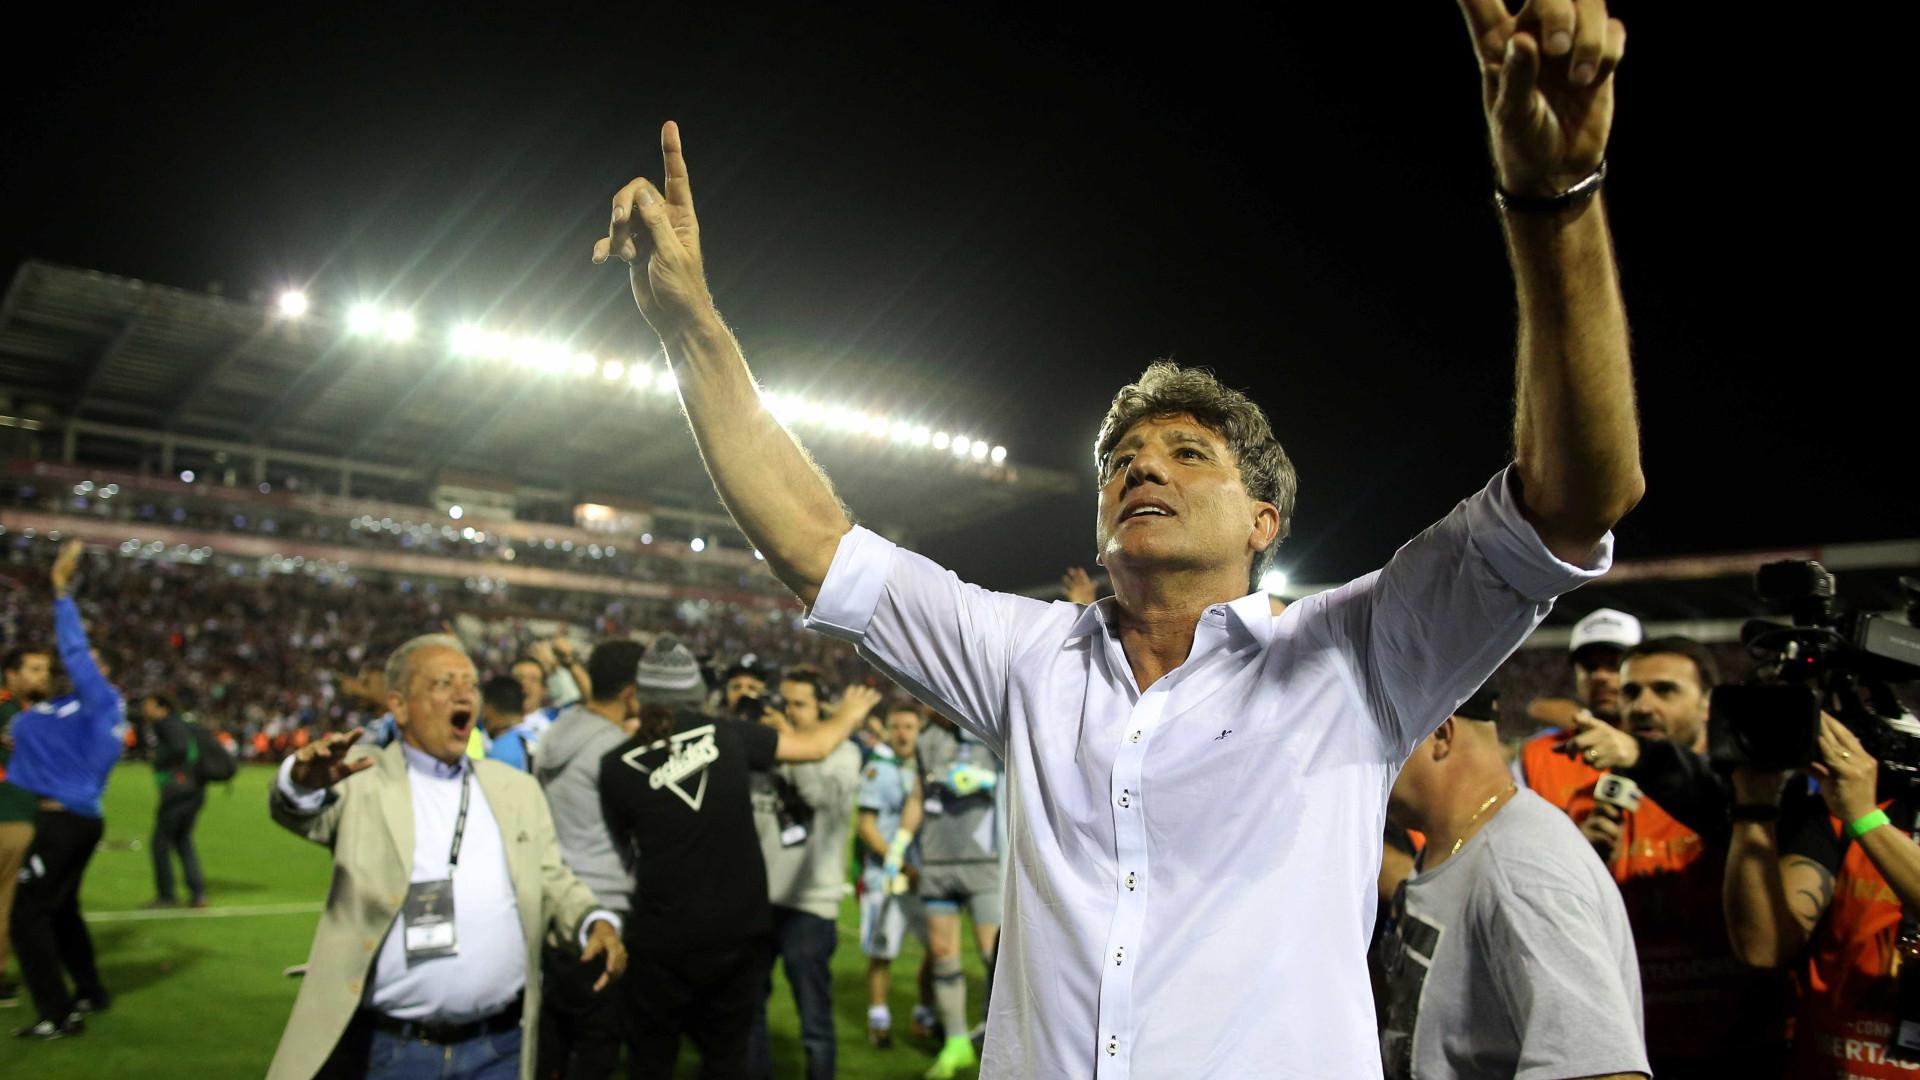 Renato é o 1º brasileiro a ganhar Libertadores como jogador e técnico